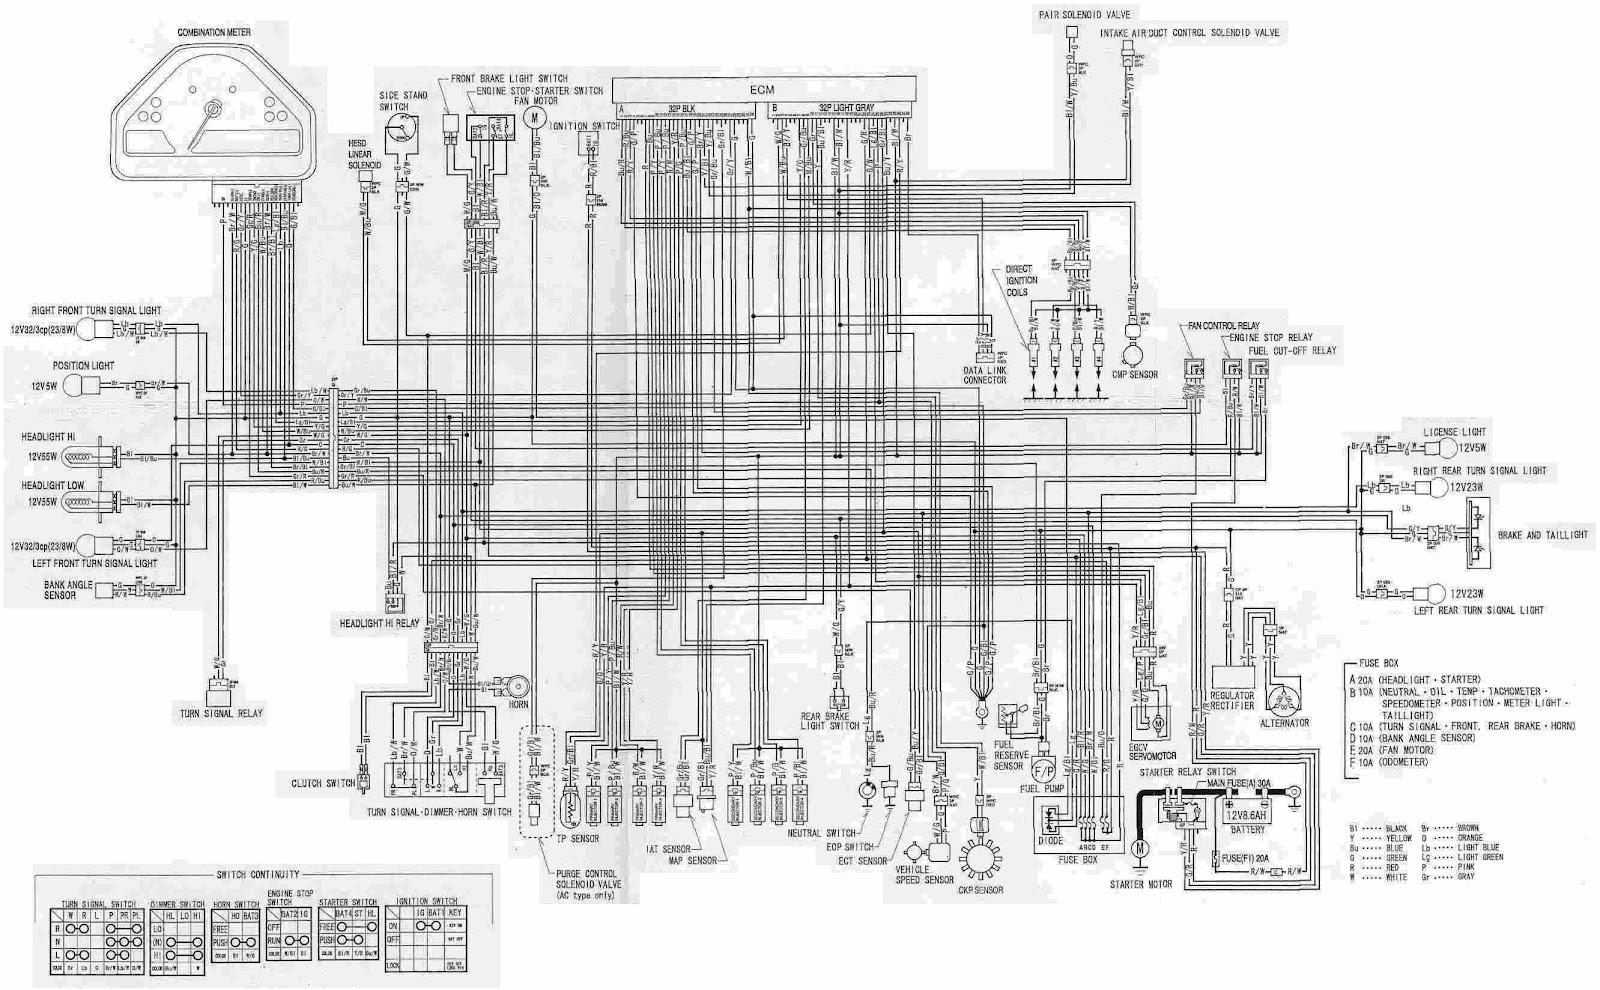 wiring diagram honda cbr1100xx example electrical wiring diagram u2022 rh huntervalleyhotels co Schematic Diagram Honda 1999 honda cbr1100xx super blackbird wiring diagram